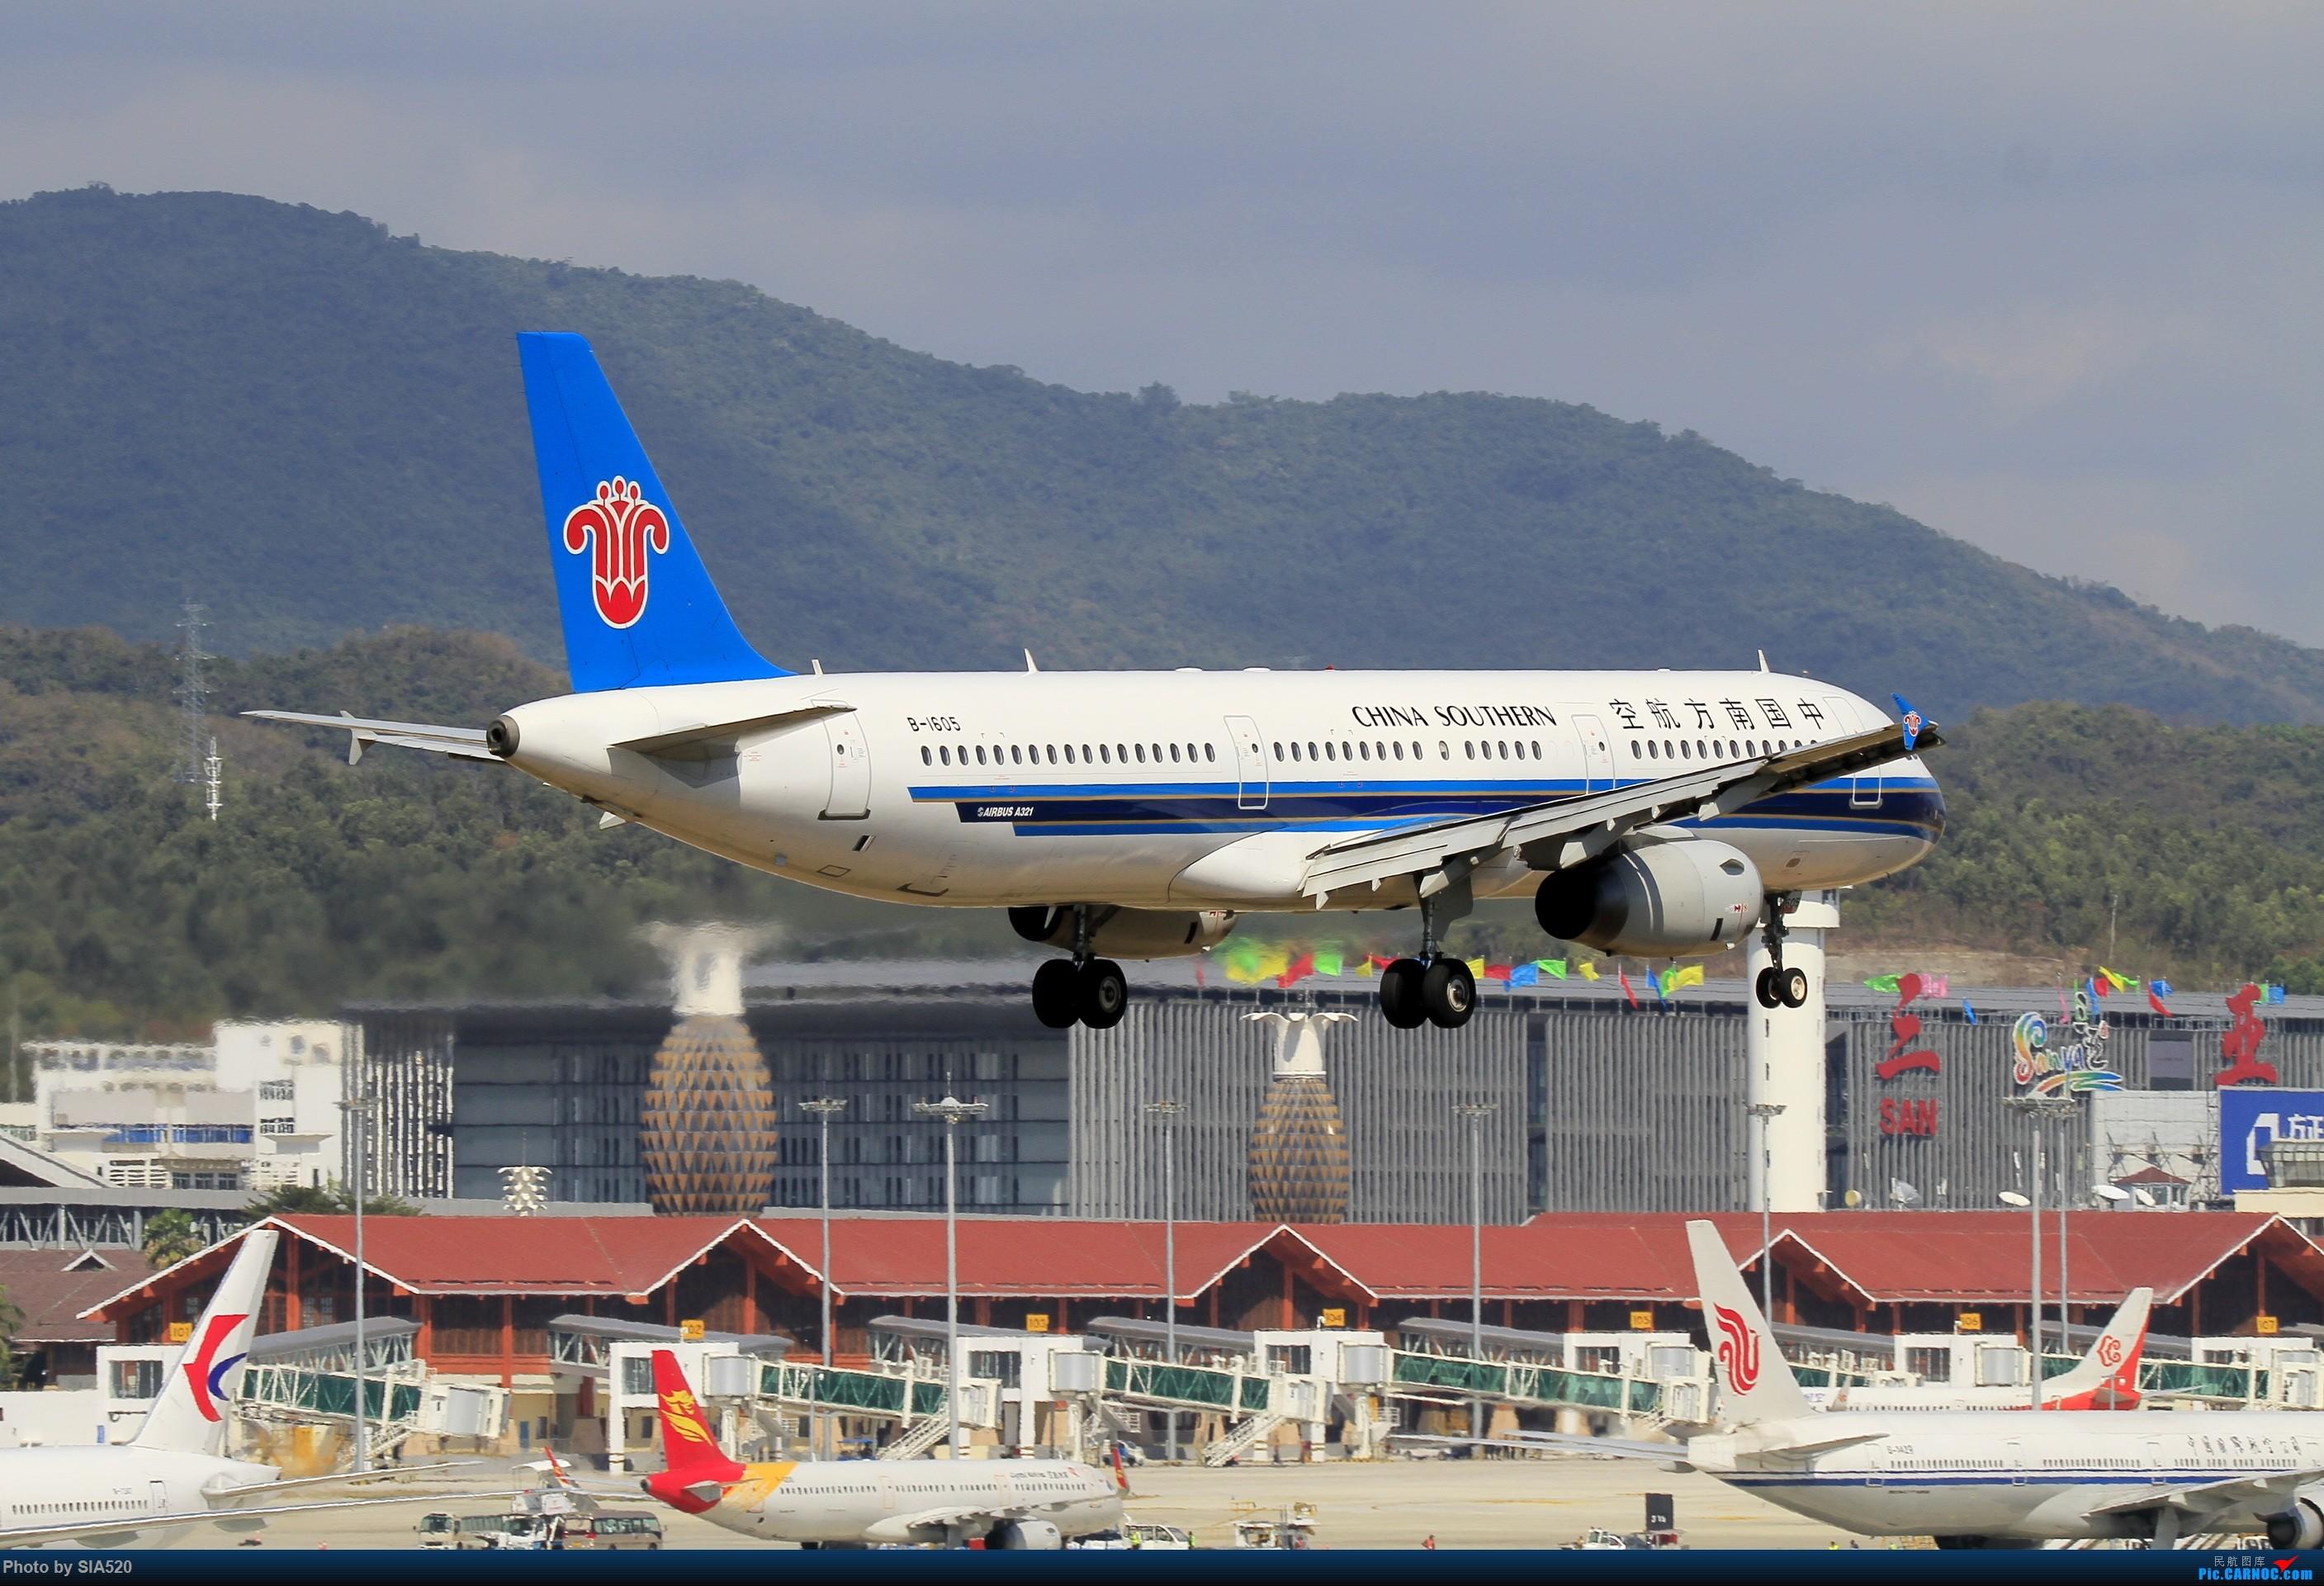 Re:[原创]北京人儿在三亚—600mm解锁凤凰 AIRBUS A321-200 B-1605 中国三亚凤凰国际机场